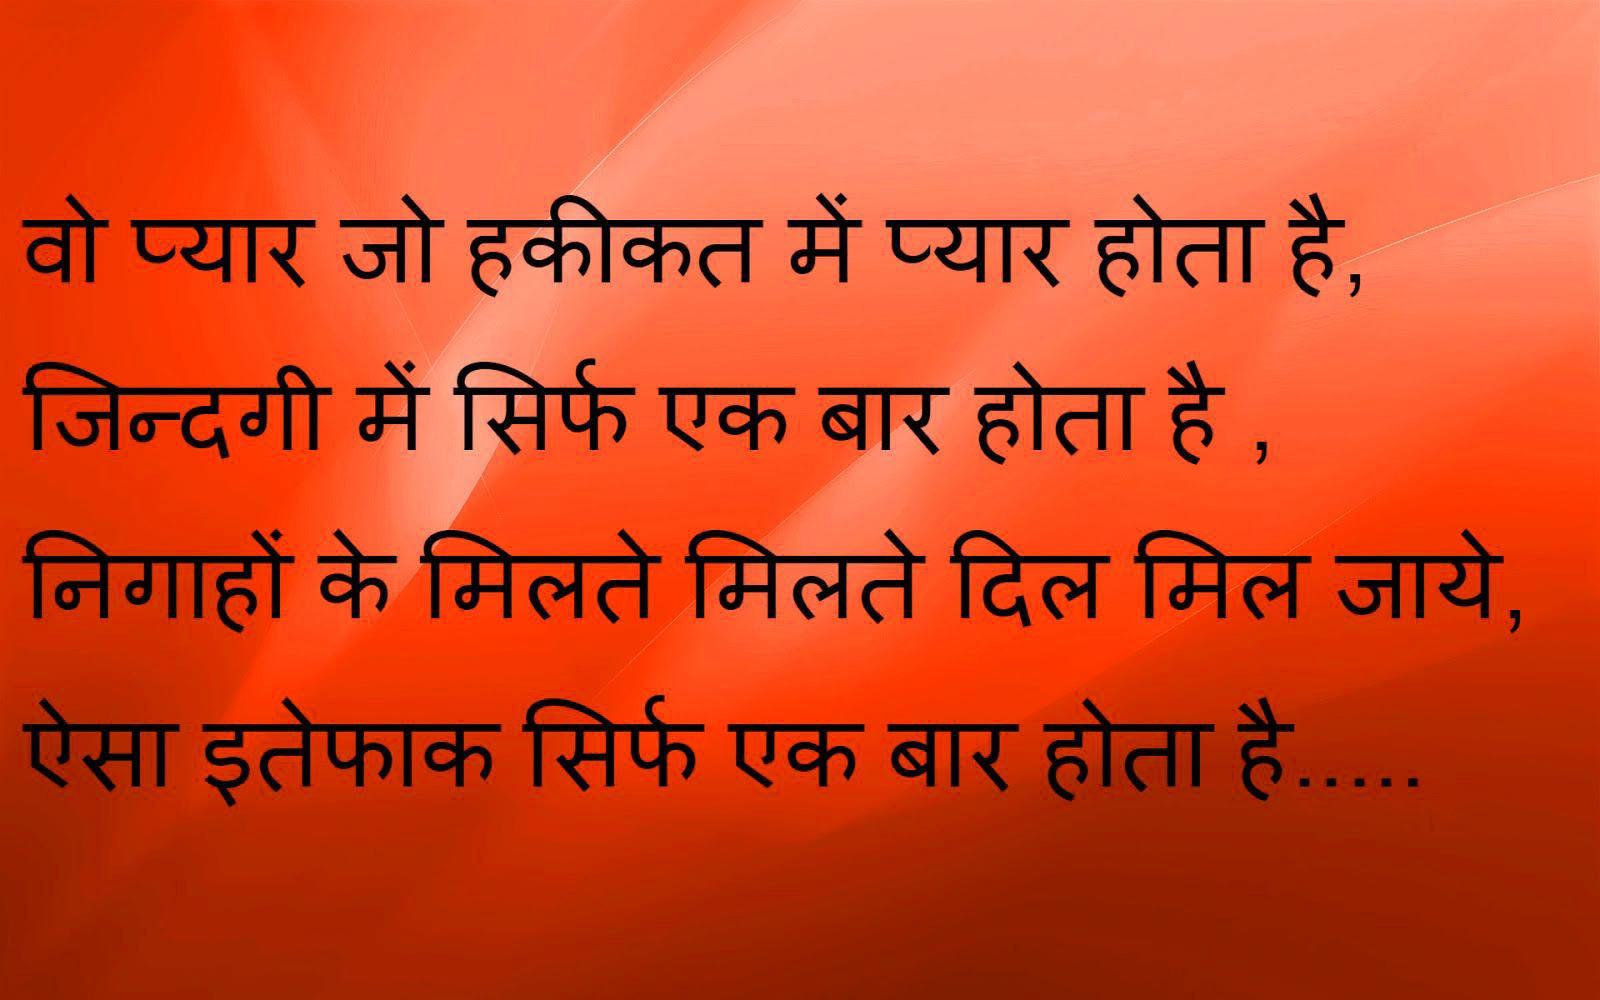 246+ Sad Love Romantic True Hindi Shayari Images Wallpaper Pics